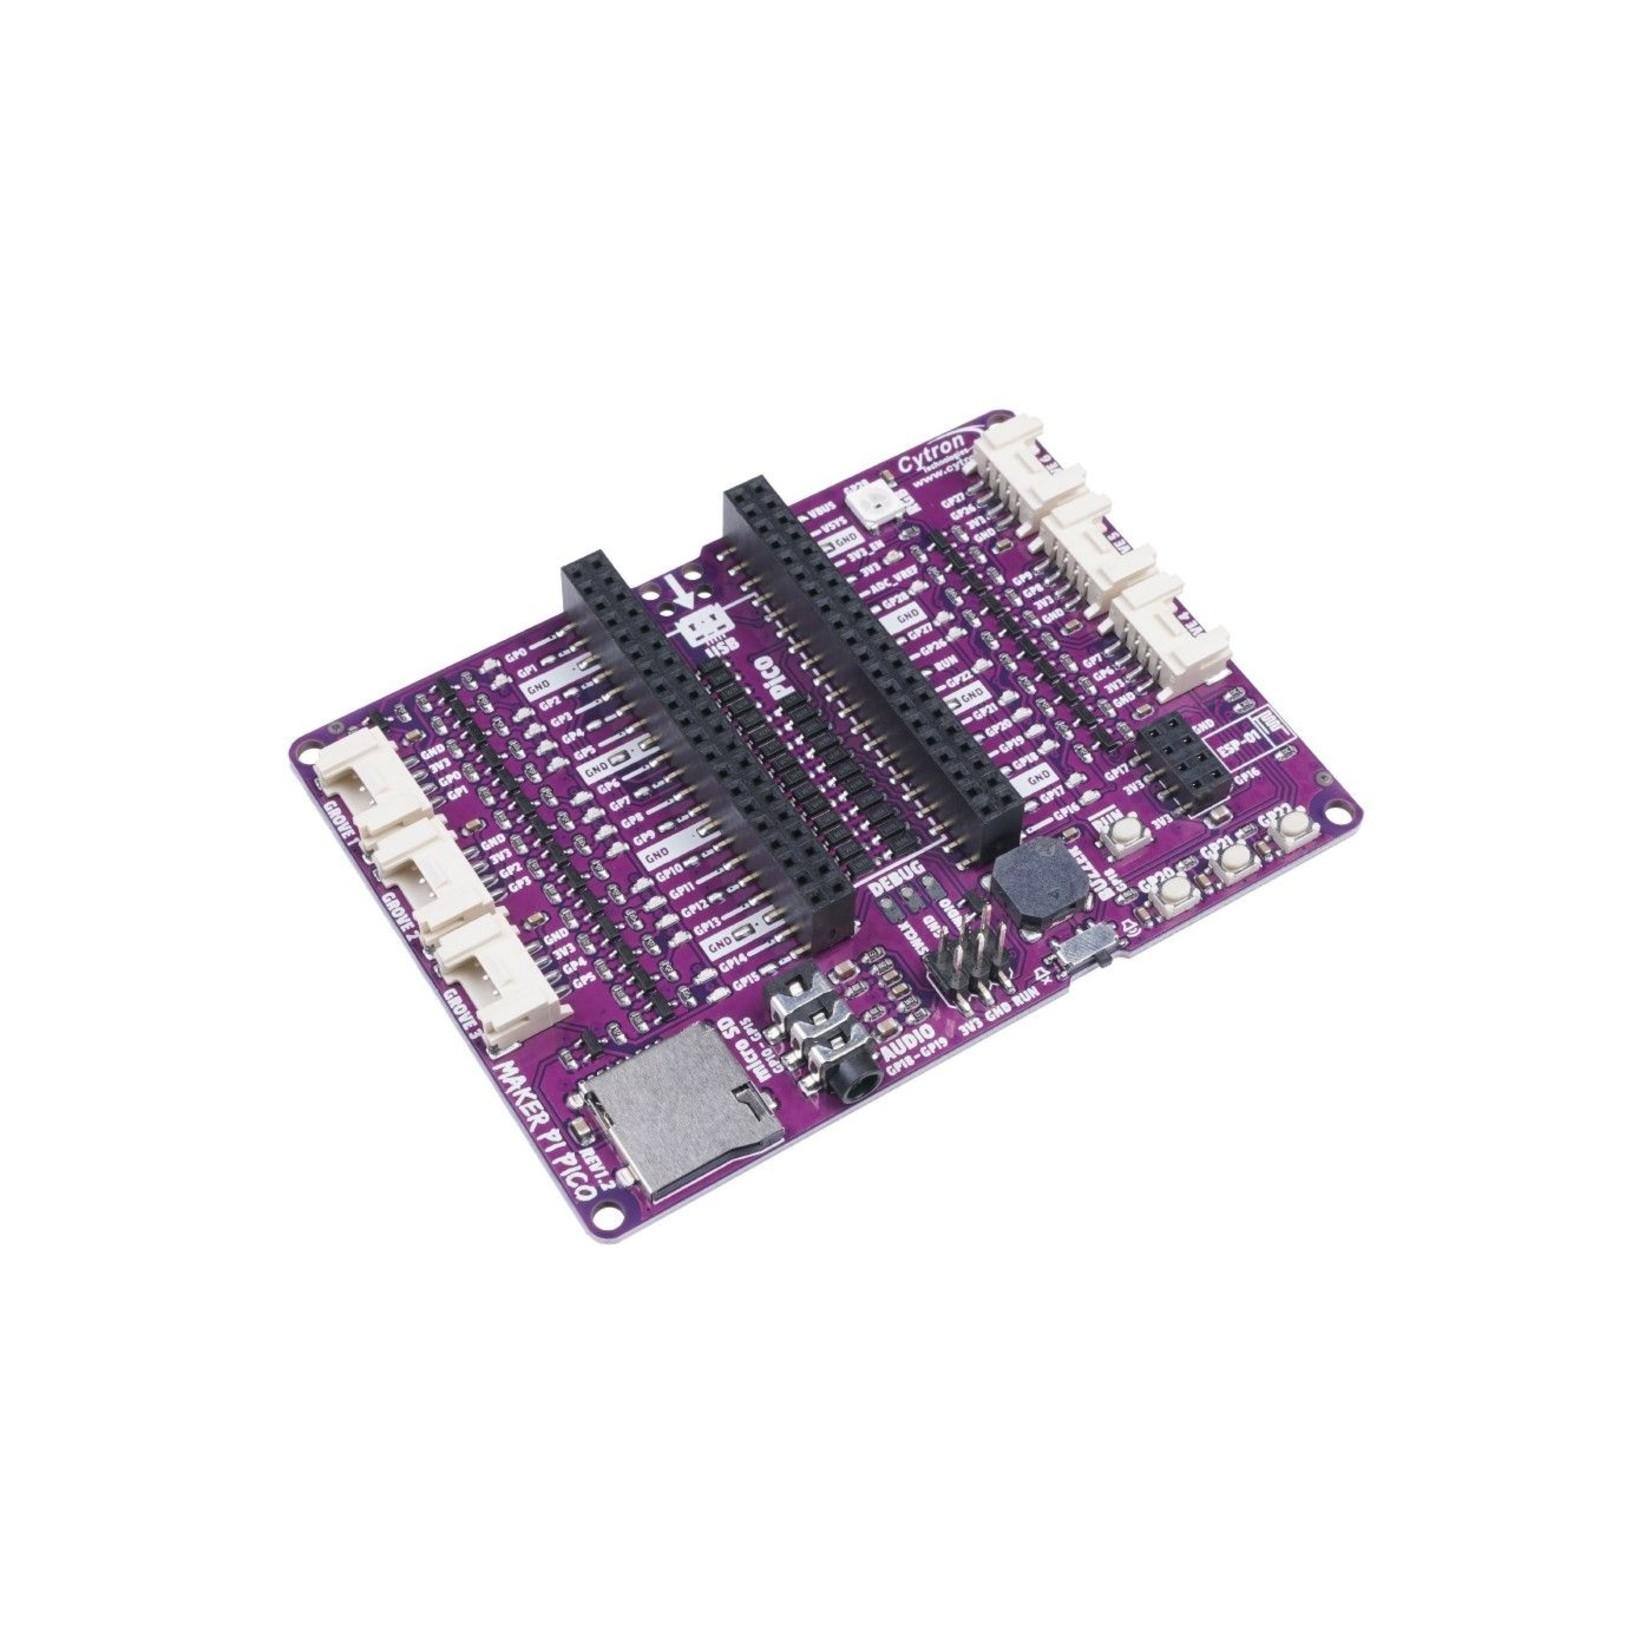 Seeed Maker Pi Pico Base (without Raspberry Pi Pico)